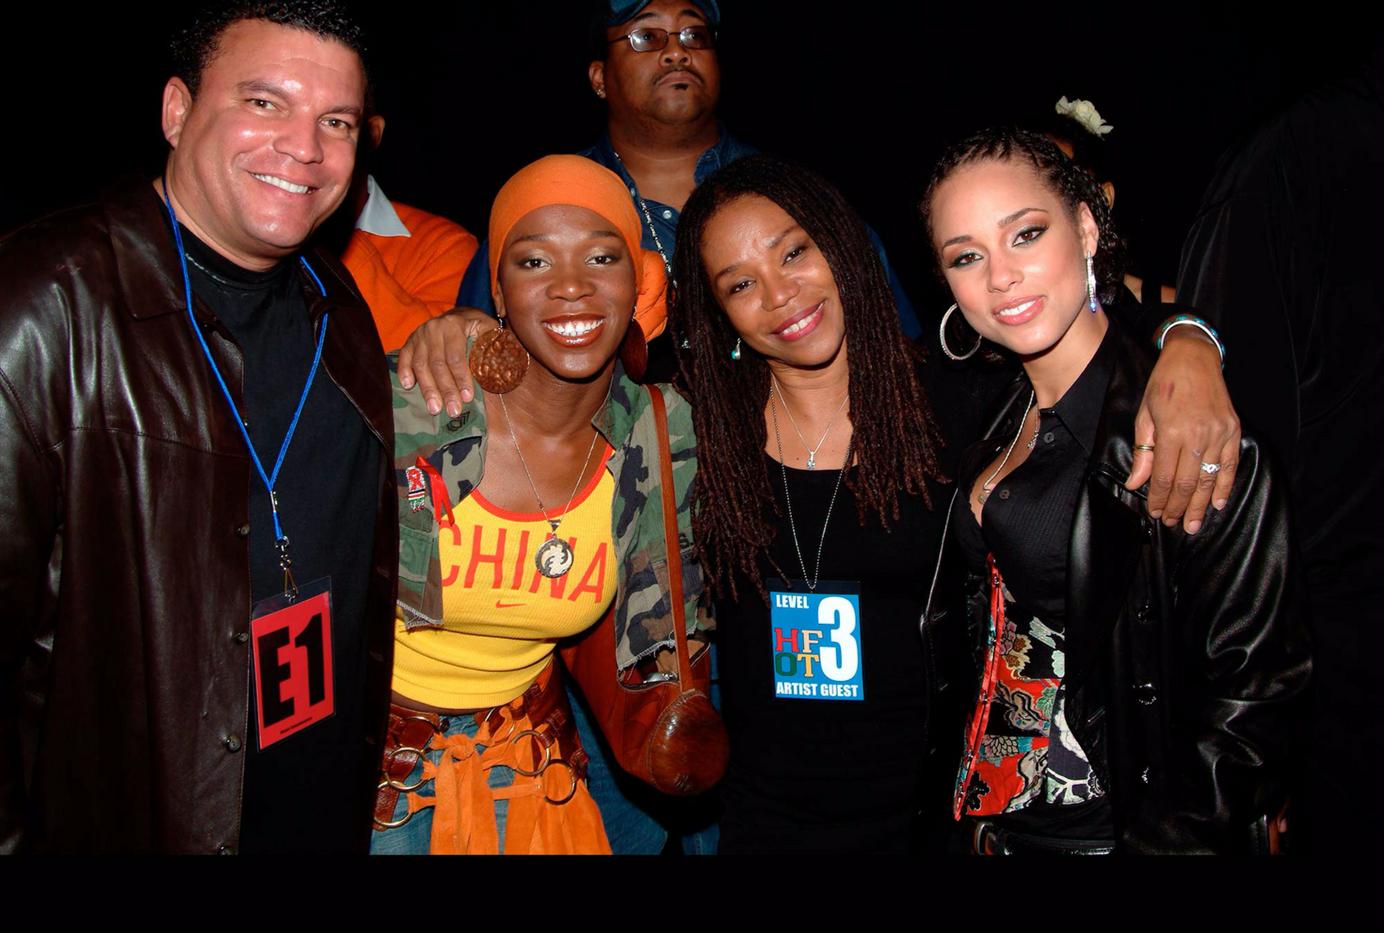 Alicia Keys, India Arie - Hammond Entertainment